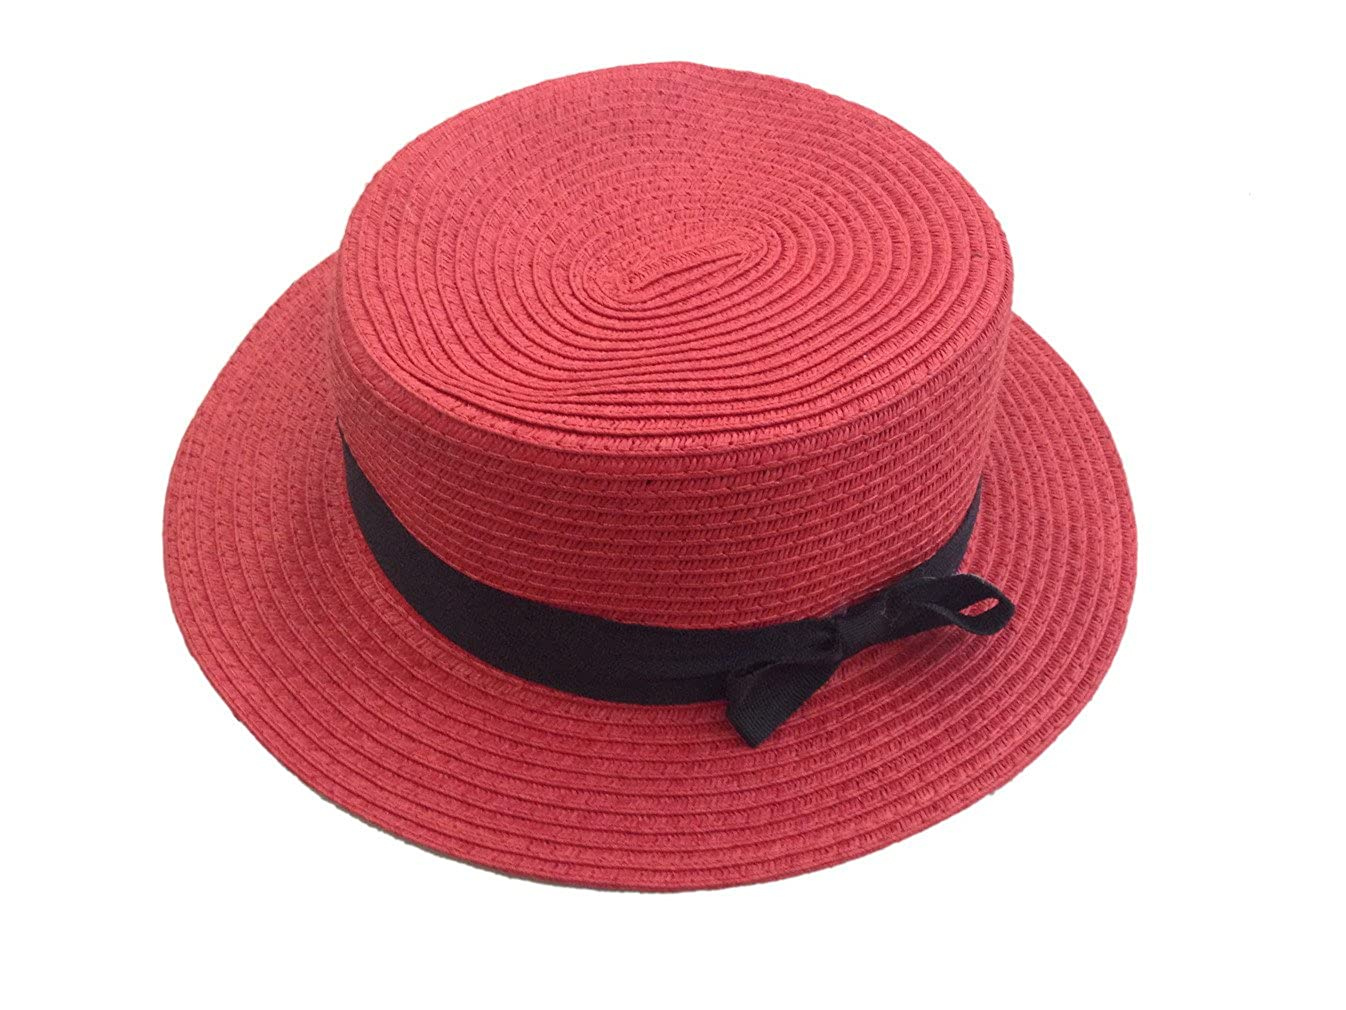 JTC Flat Straw Sun Hat Short Brim Cap Bucket Bow Visor Photography Prop Outfit